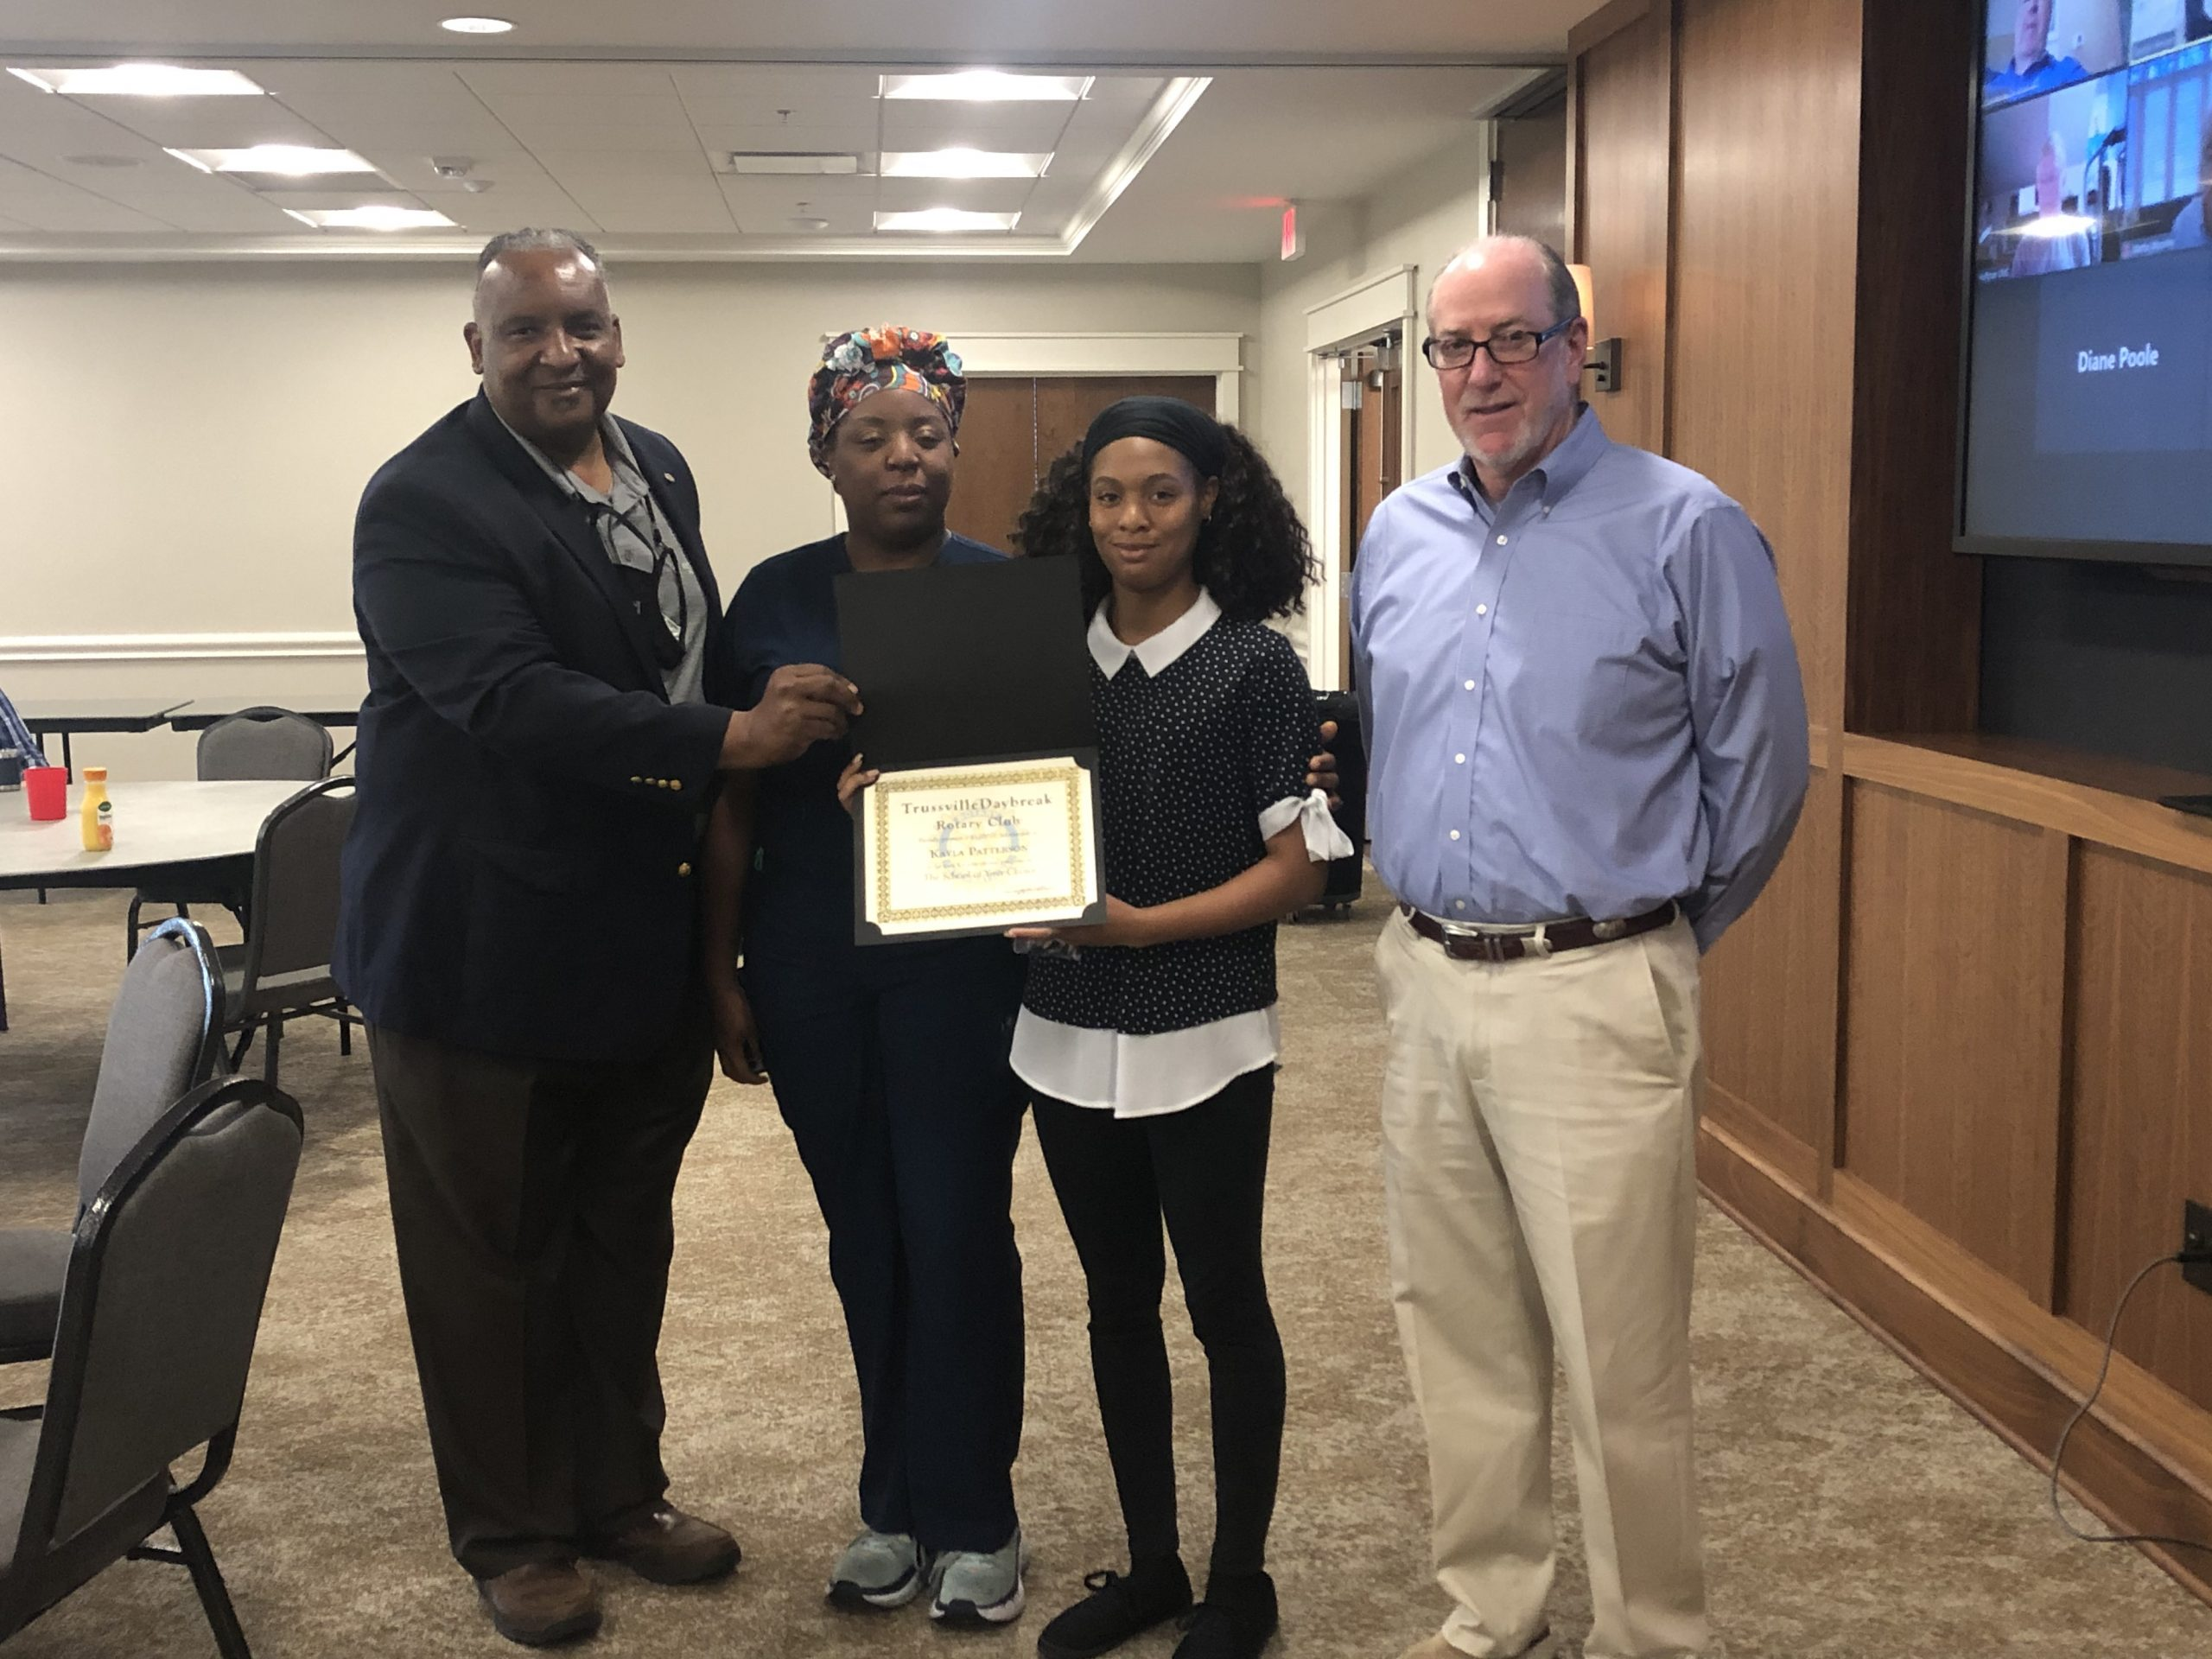 Trussville Rotary Club announces scholarship recipient